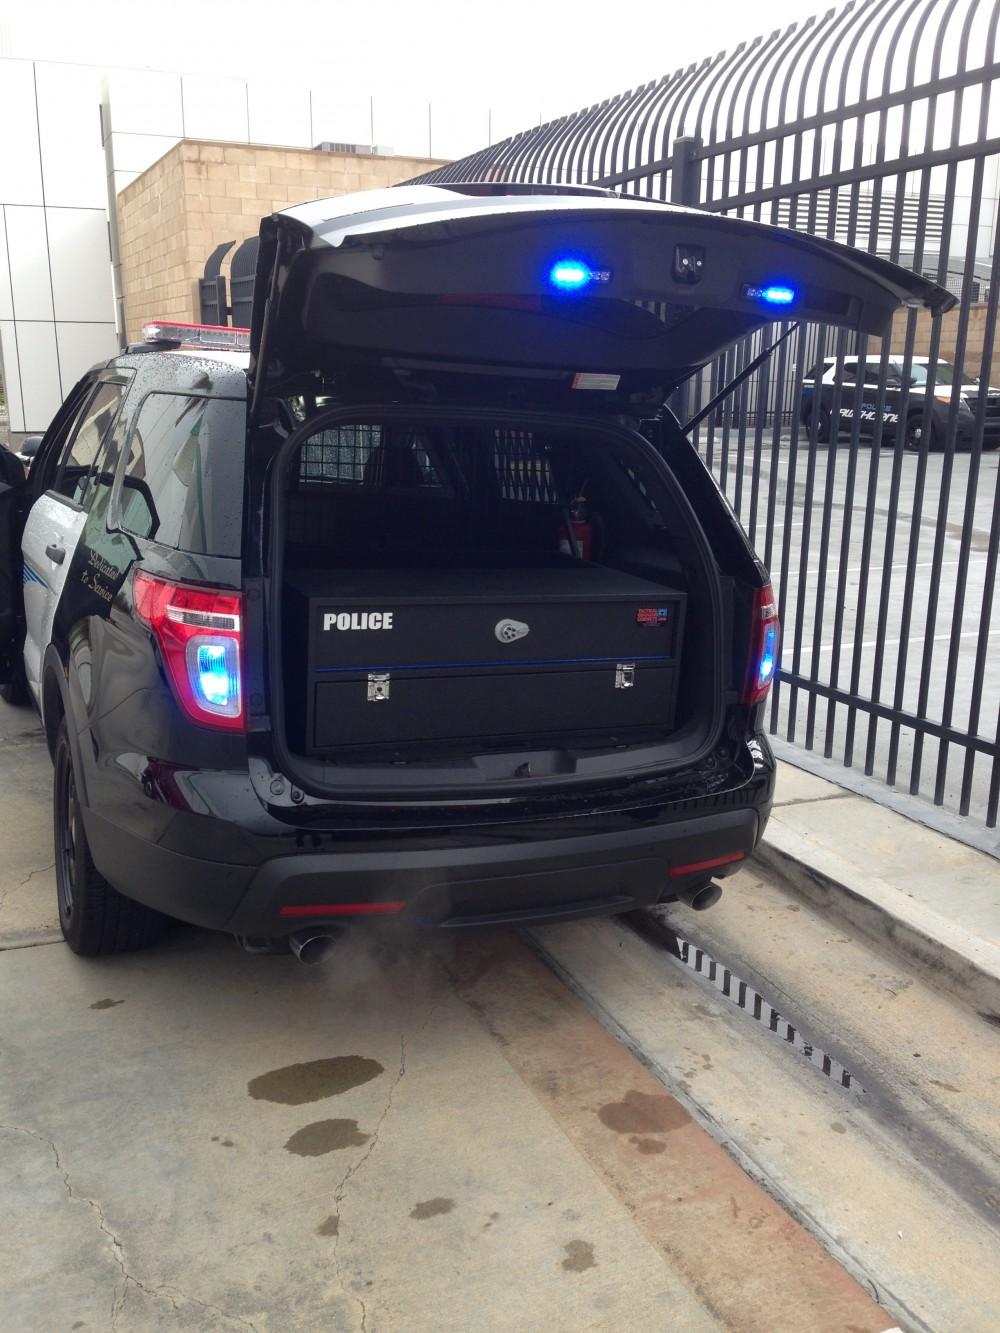 Police Explorer storage